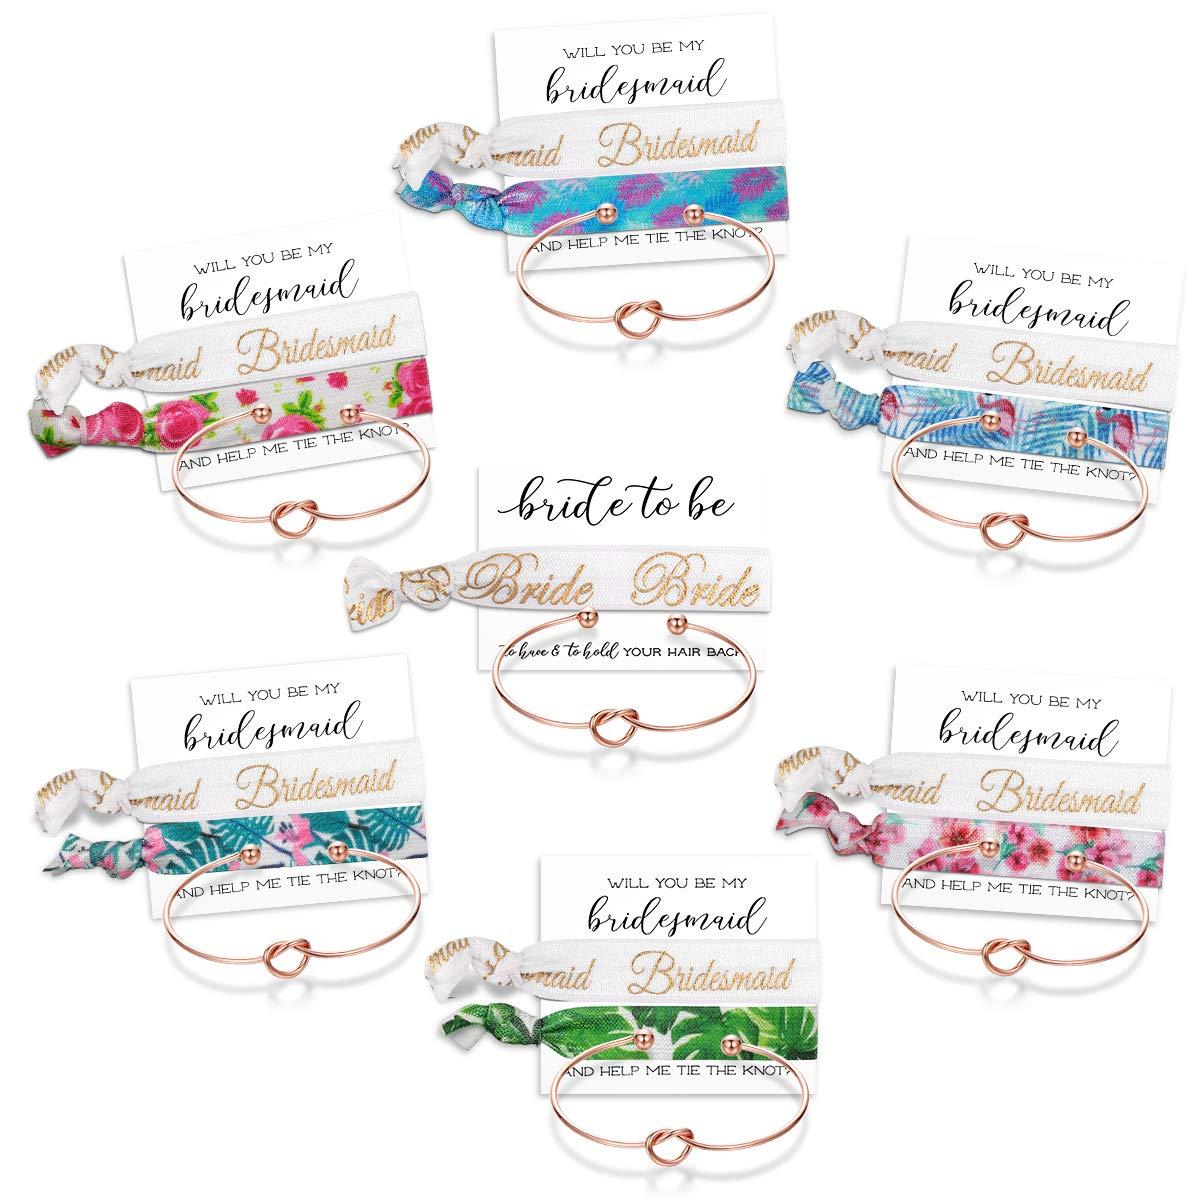 Mookoo 9 7 6 Set Bride Tribe Hair Tie and Bracelets Bridal Shower Cuff for Girls Women Bridemaid Love Knot Bracelets set